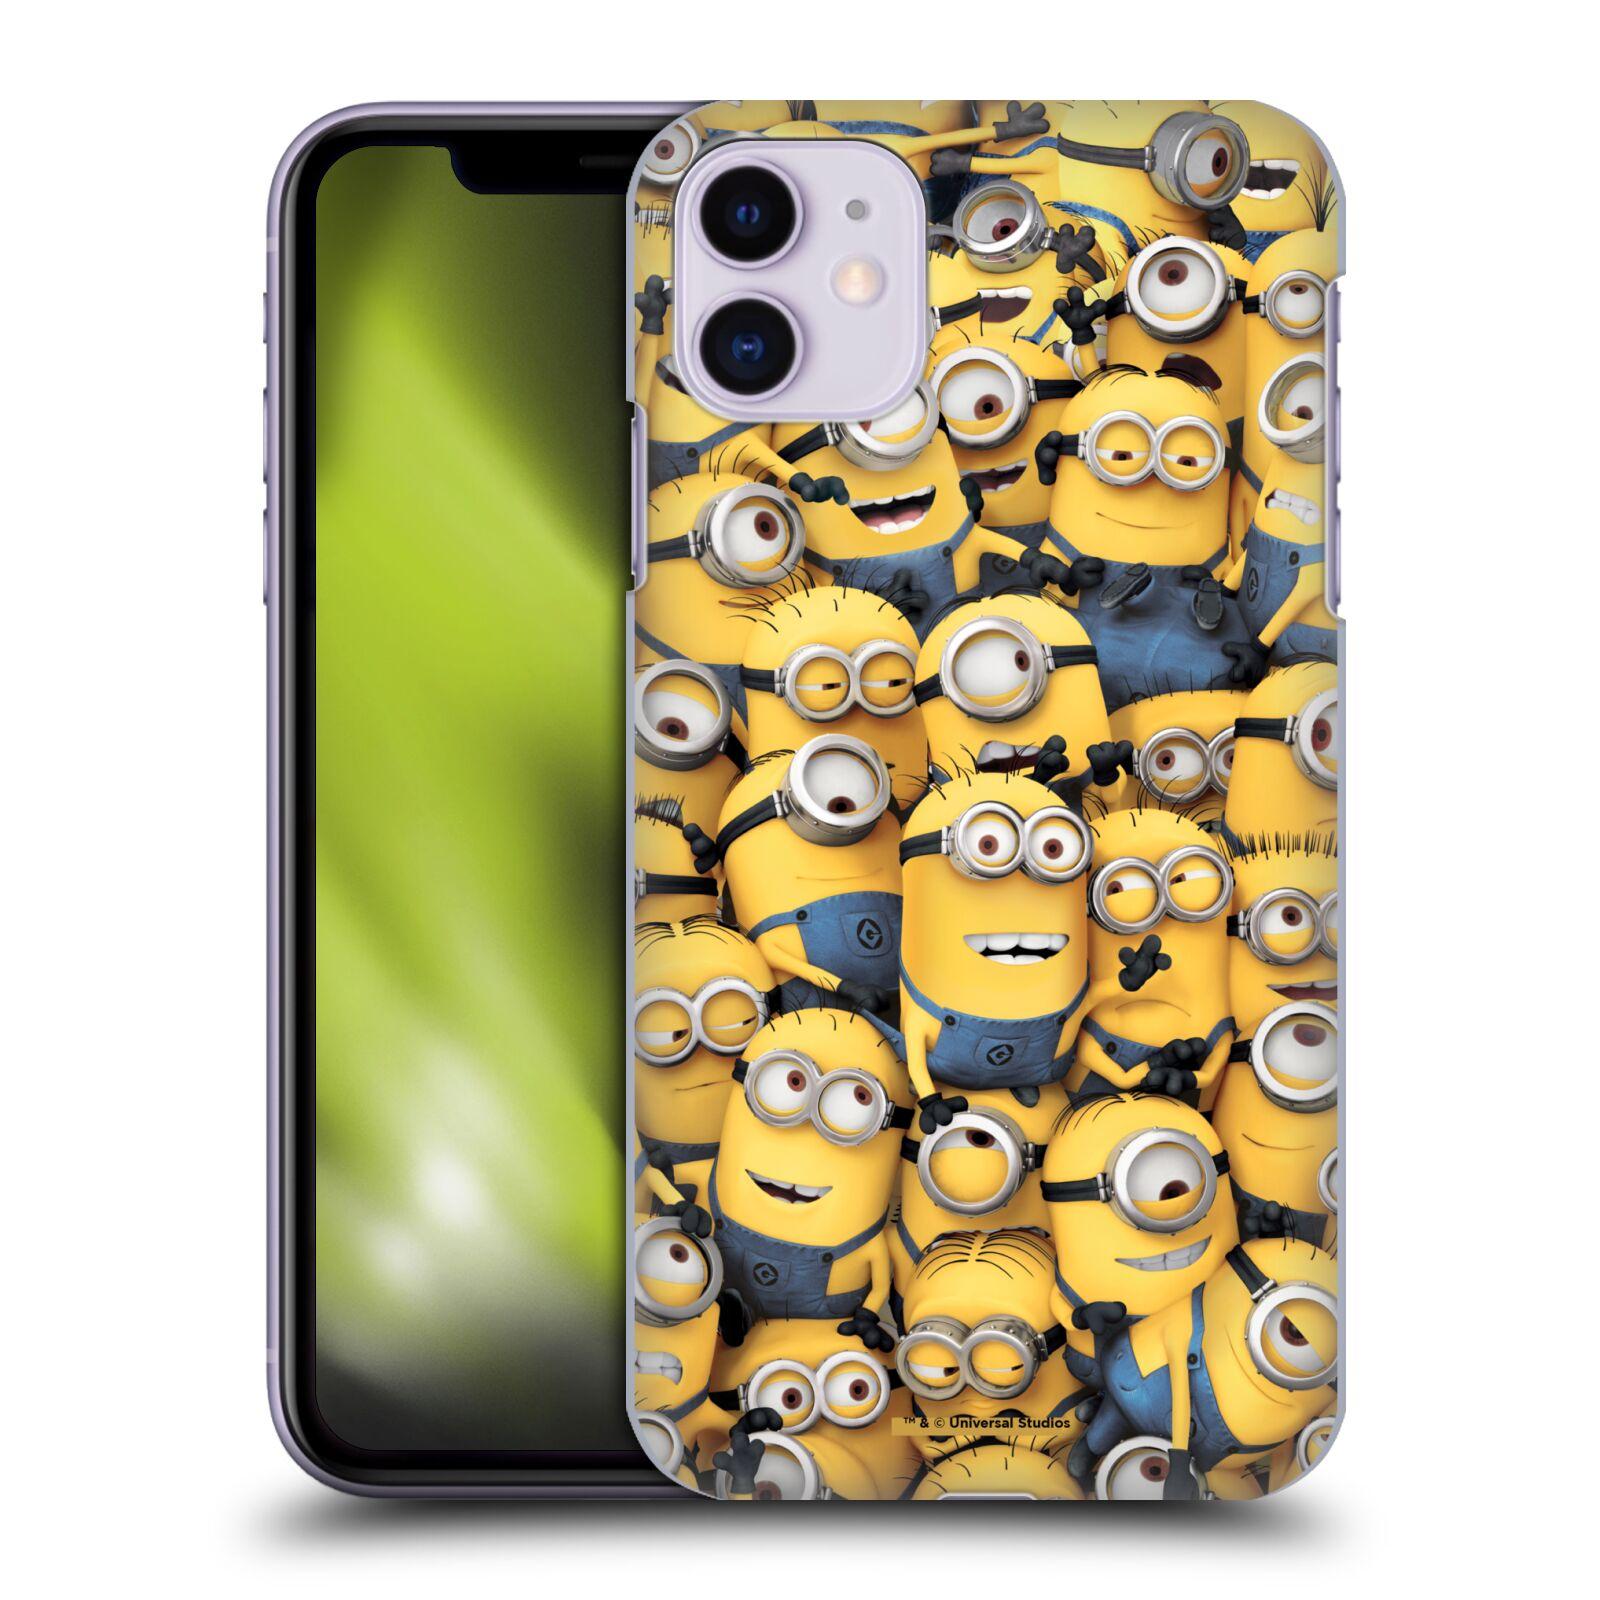 Plastové pouzdro na mobil Apple iPhone 11 - Head Case - Mimoni všude z filmu Já, padouch - Despicable Me